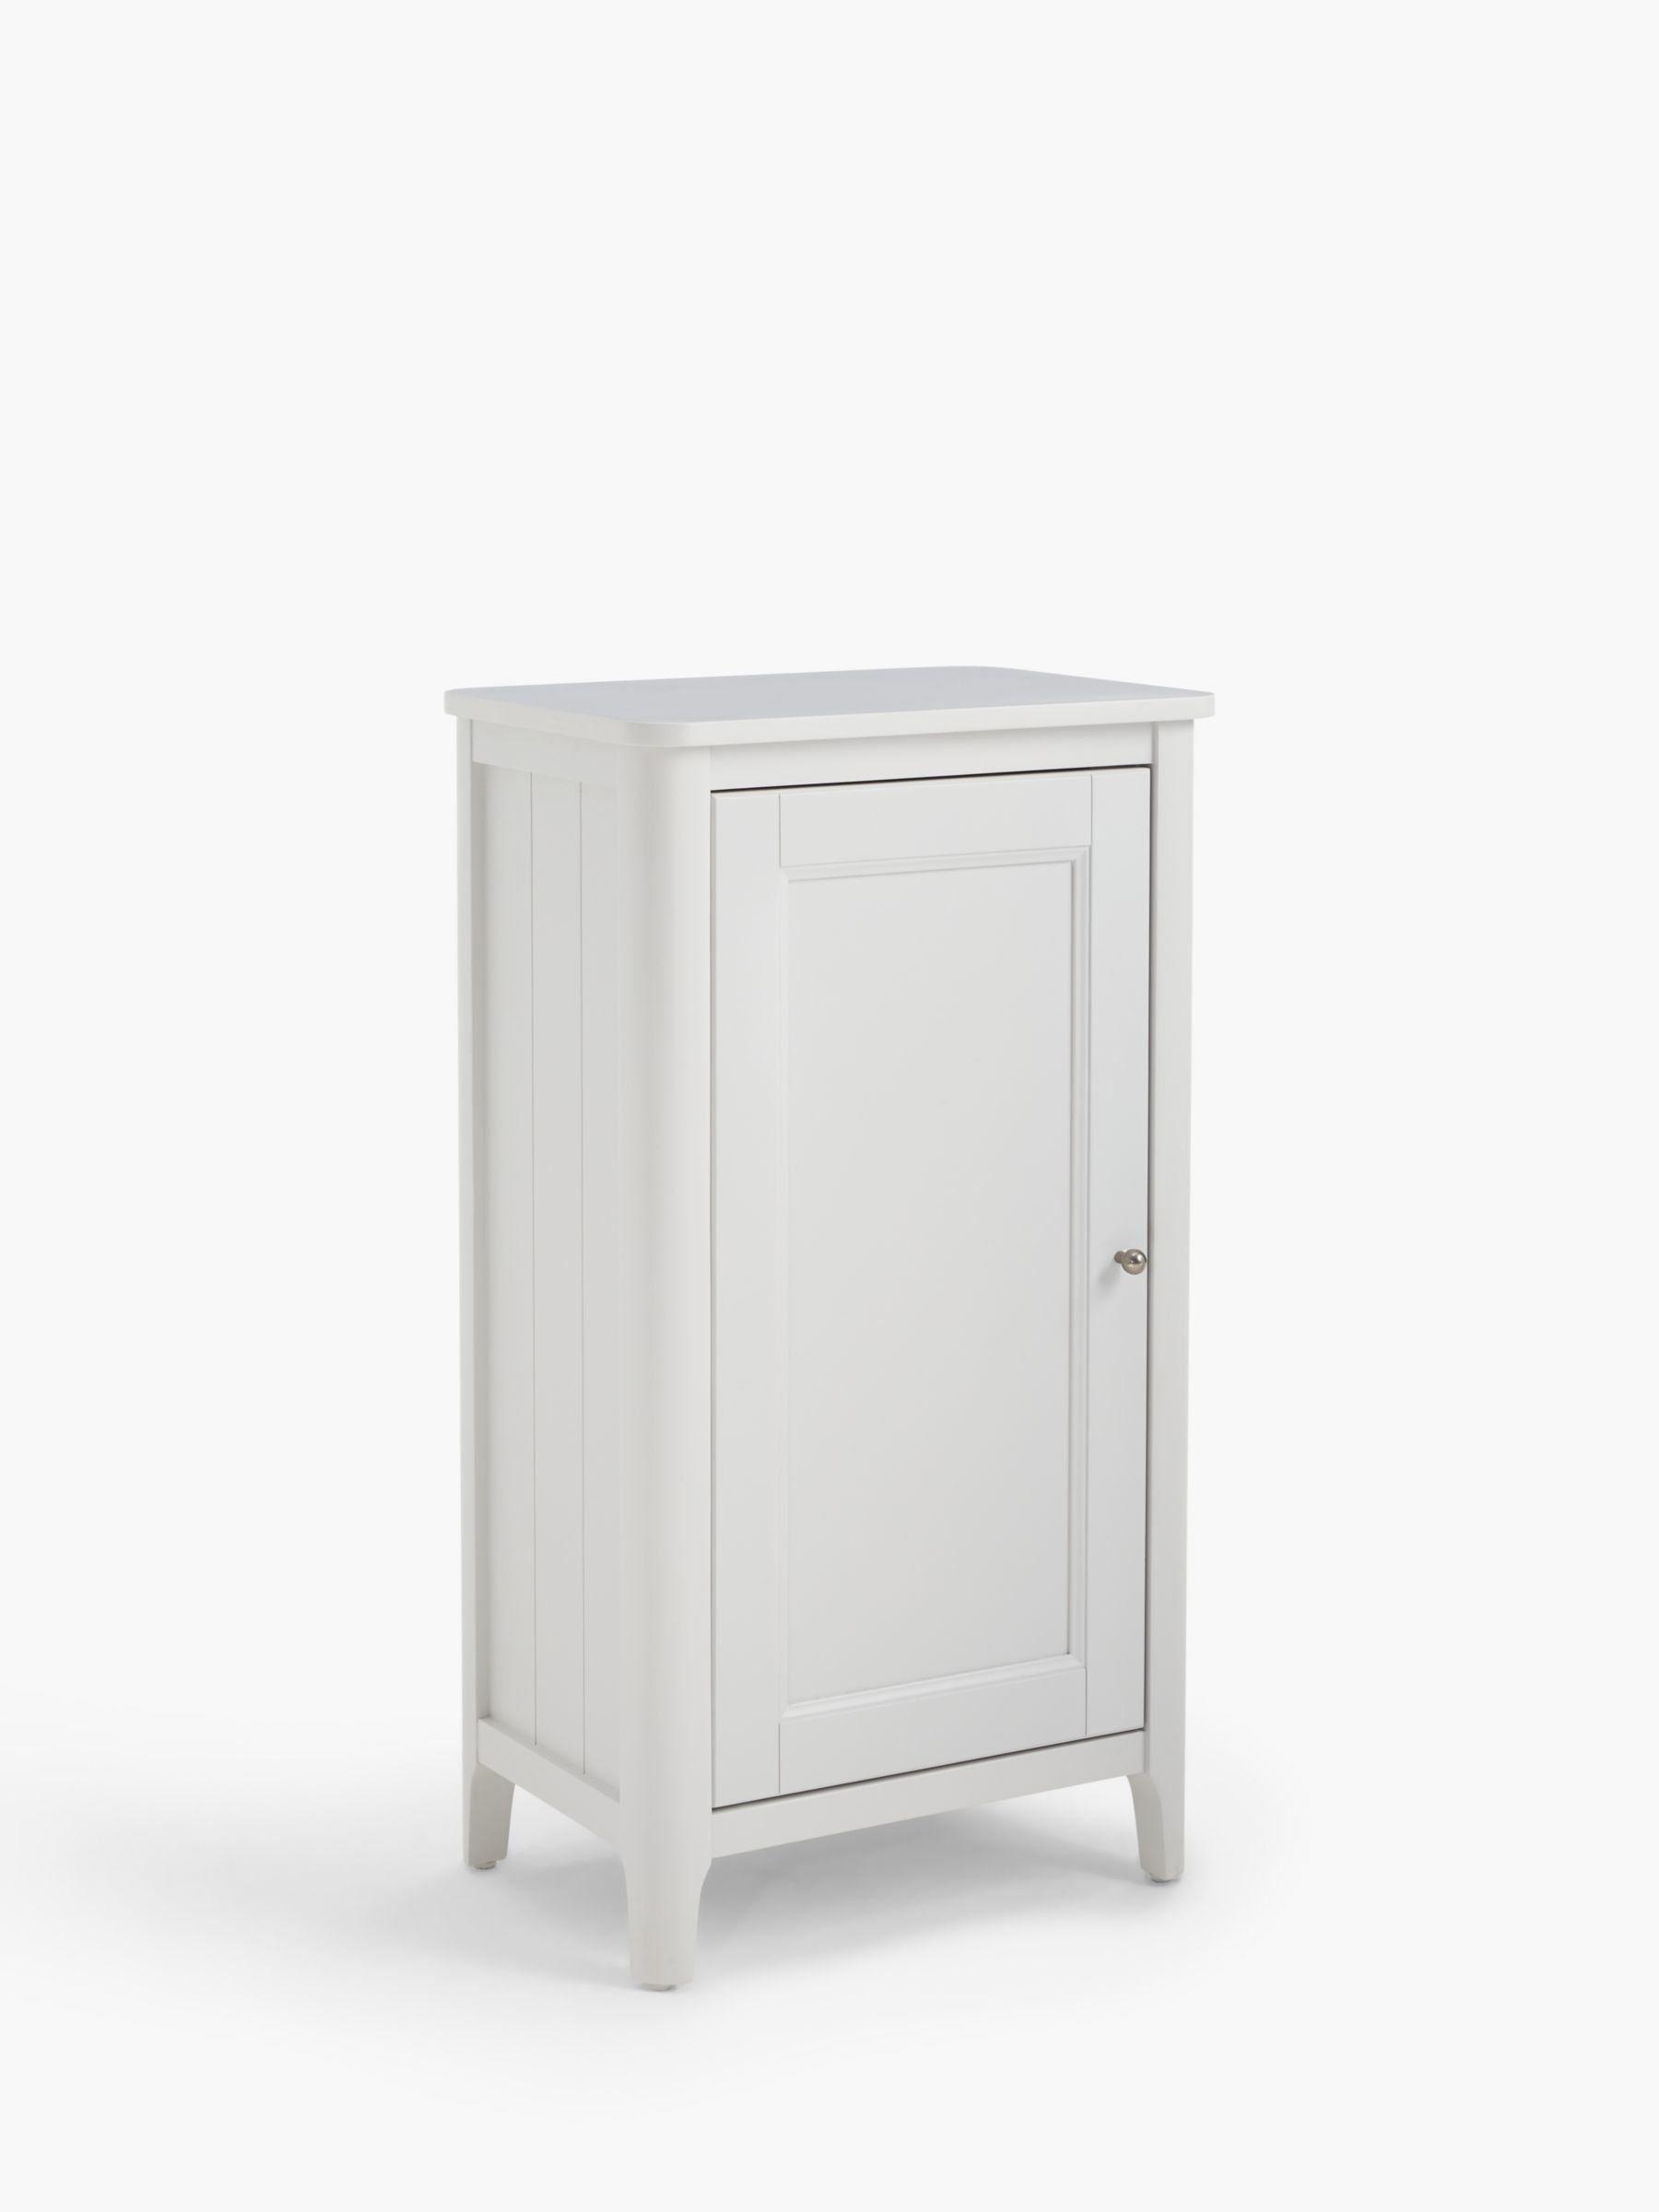 John Lewis Amp Partners Portsman Single Towel Storage Cupboard 1000 Towel Storage Cupboard Storage Storage